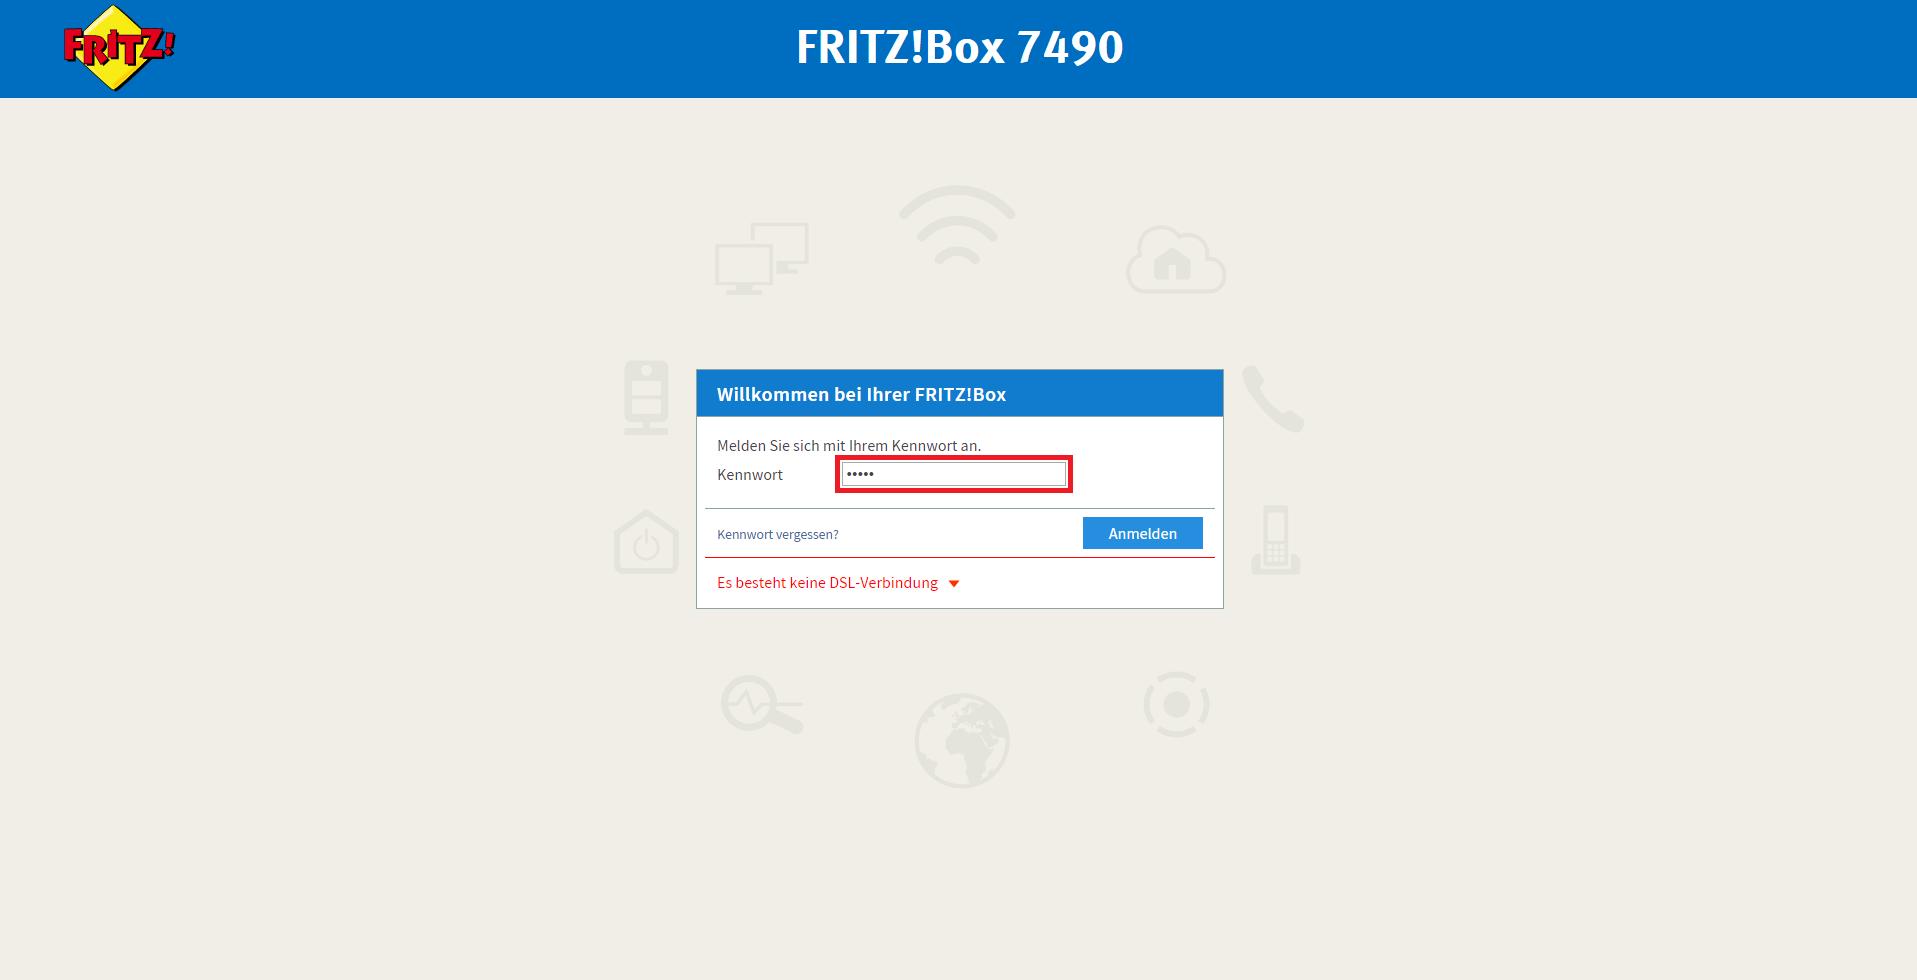 Fritz Box 7490 Interoperability Manual